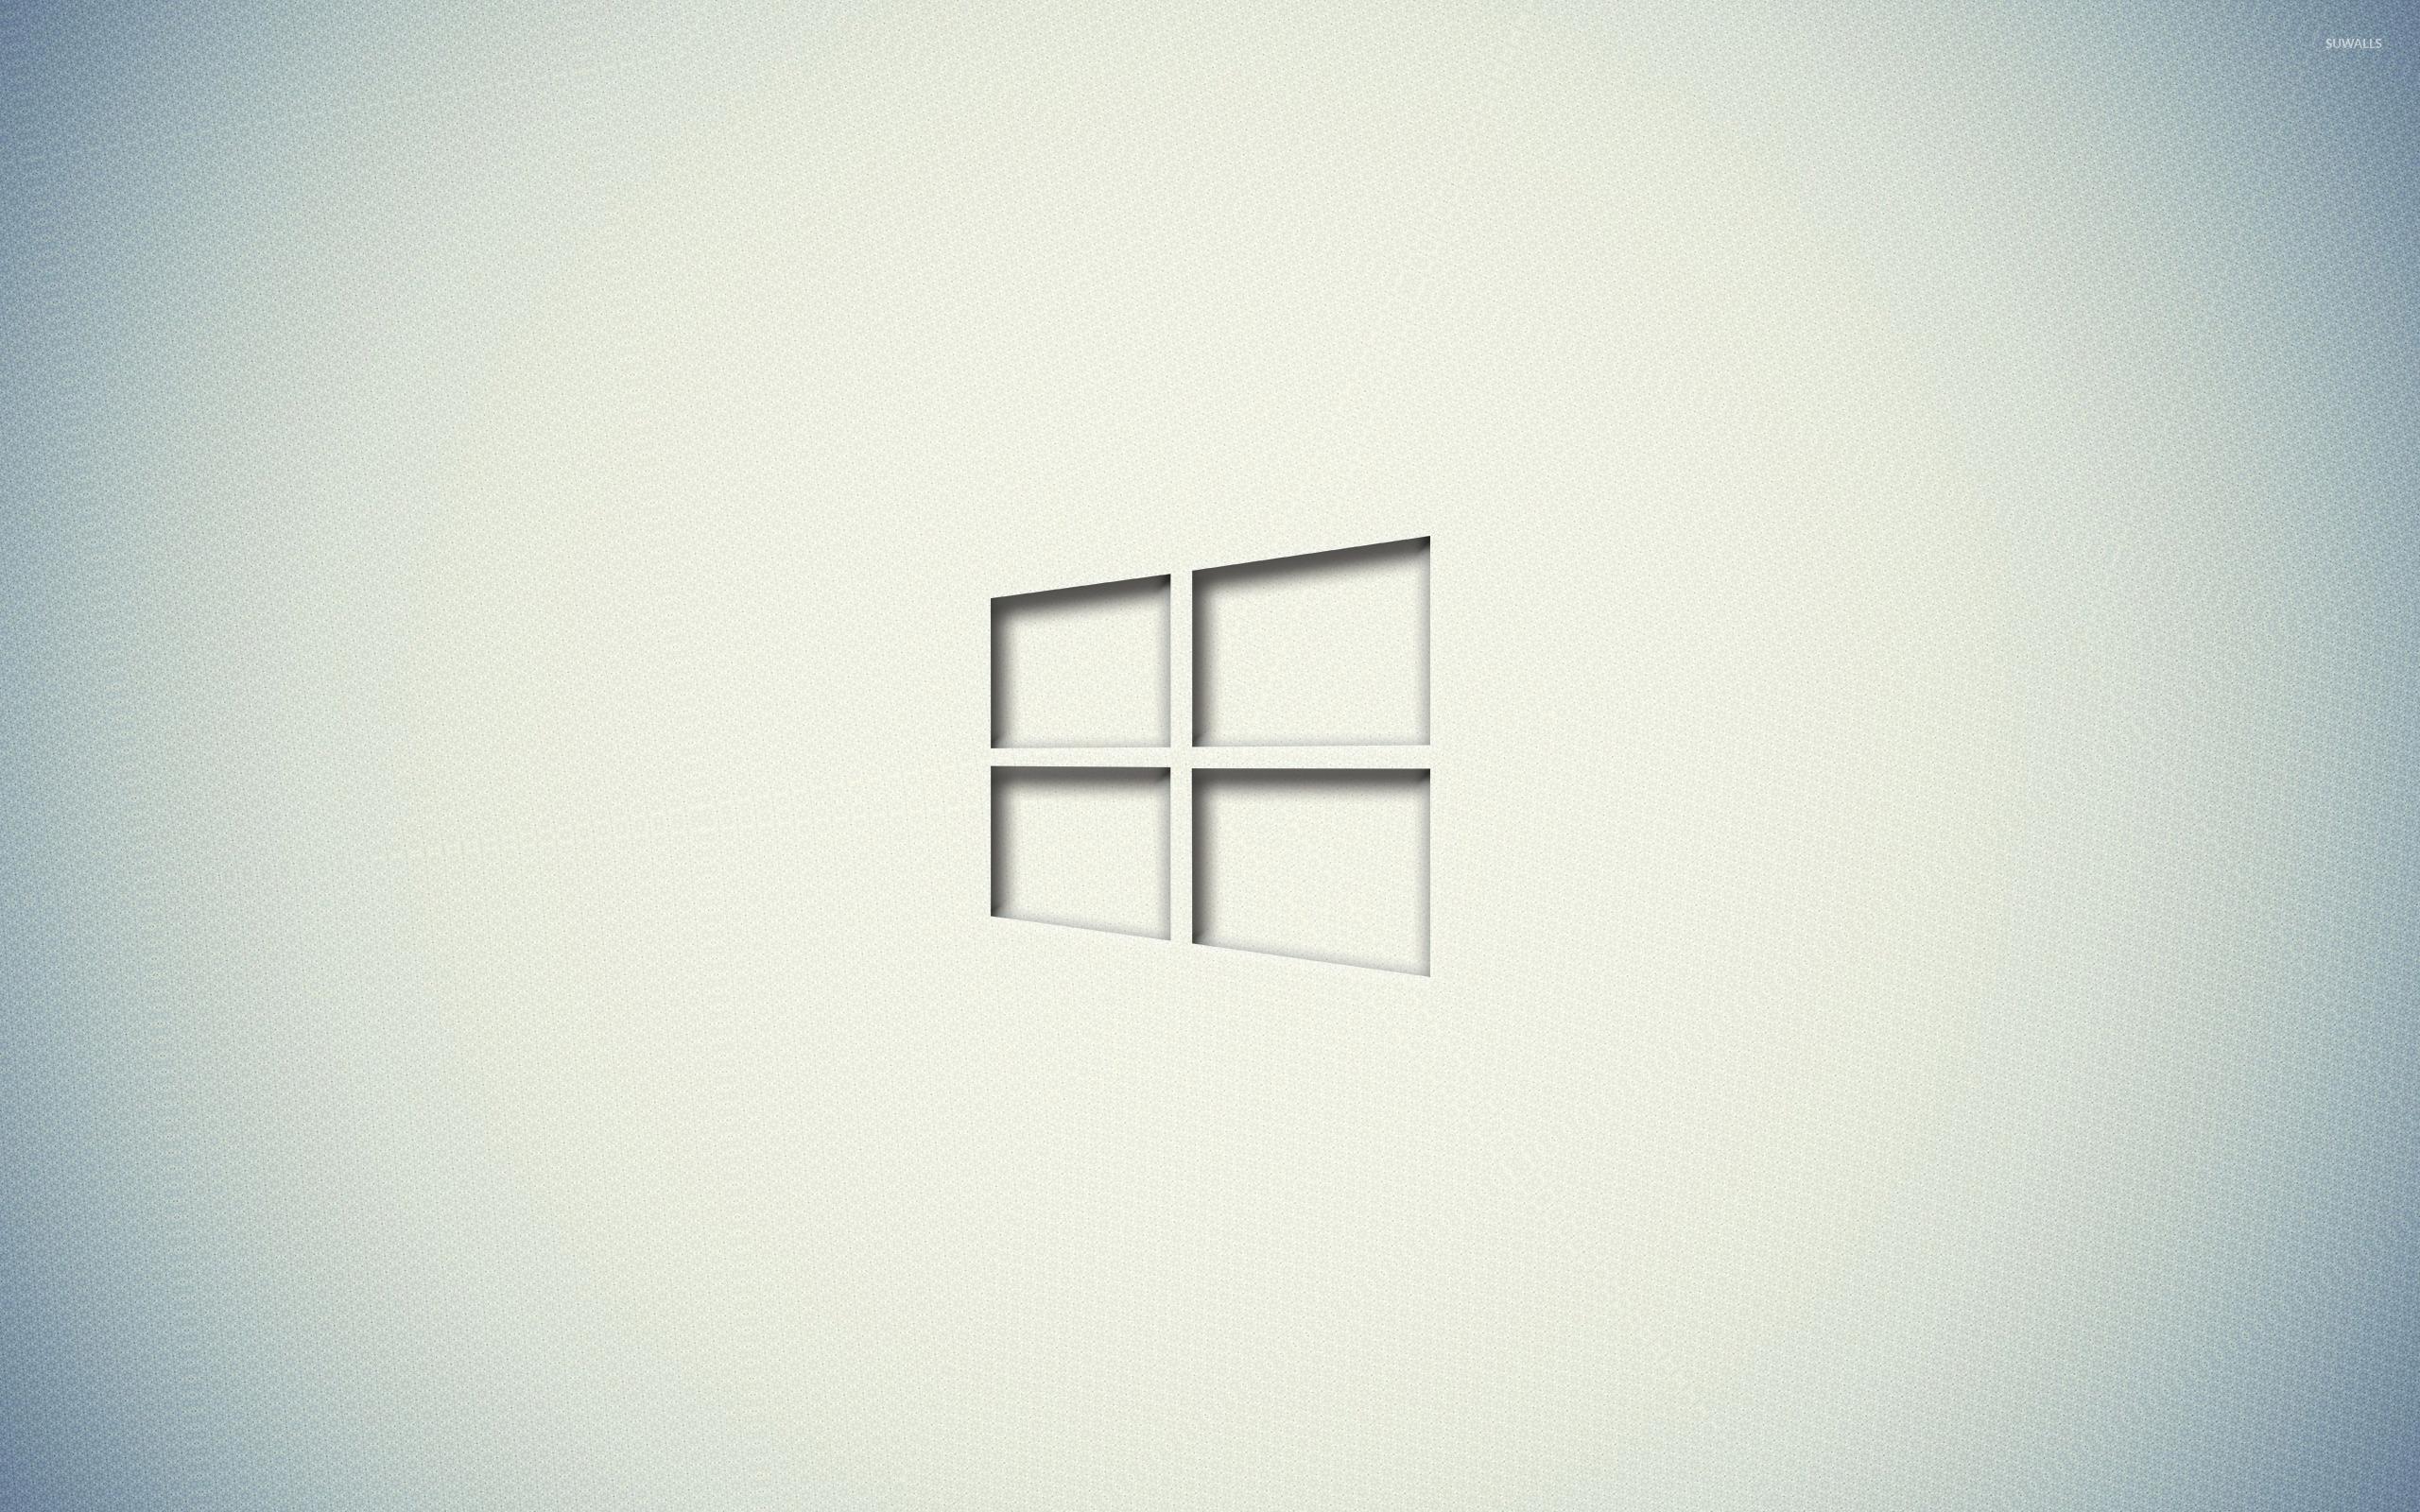 Windows 10 transparent logo on a white wall wallpaper for White wallpaper for walls